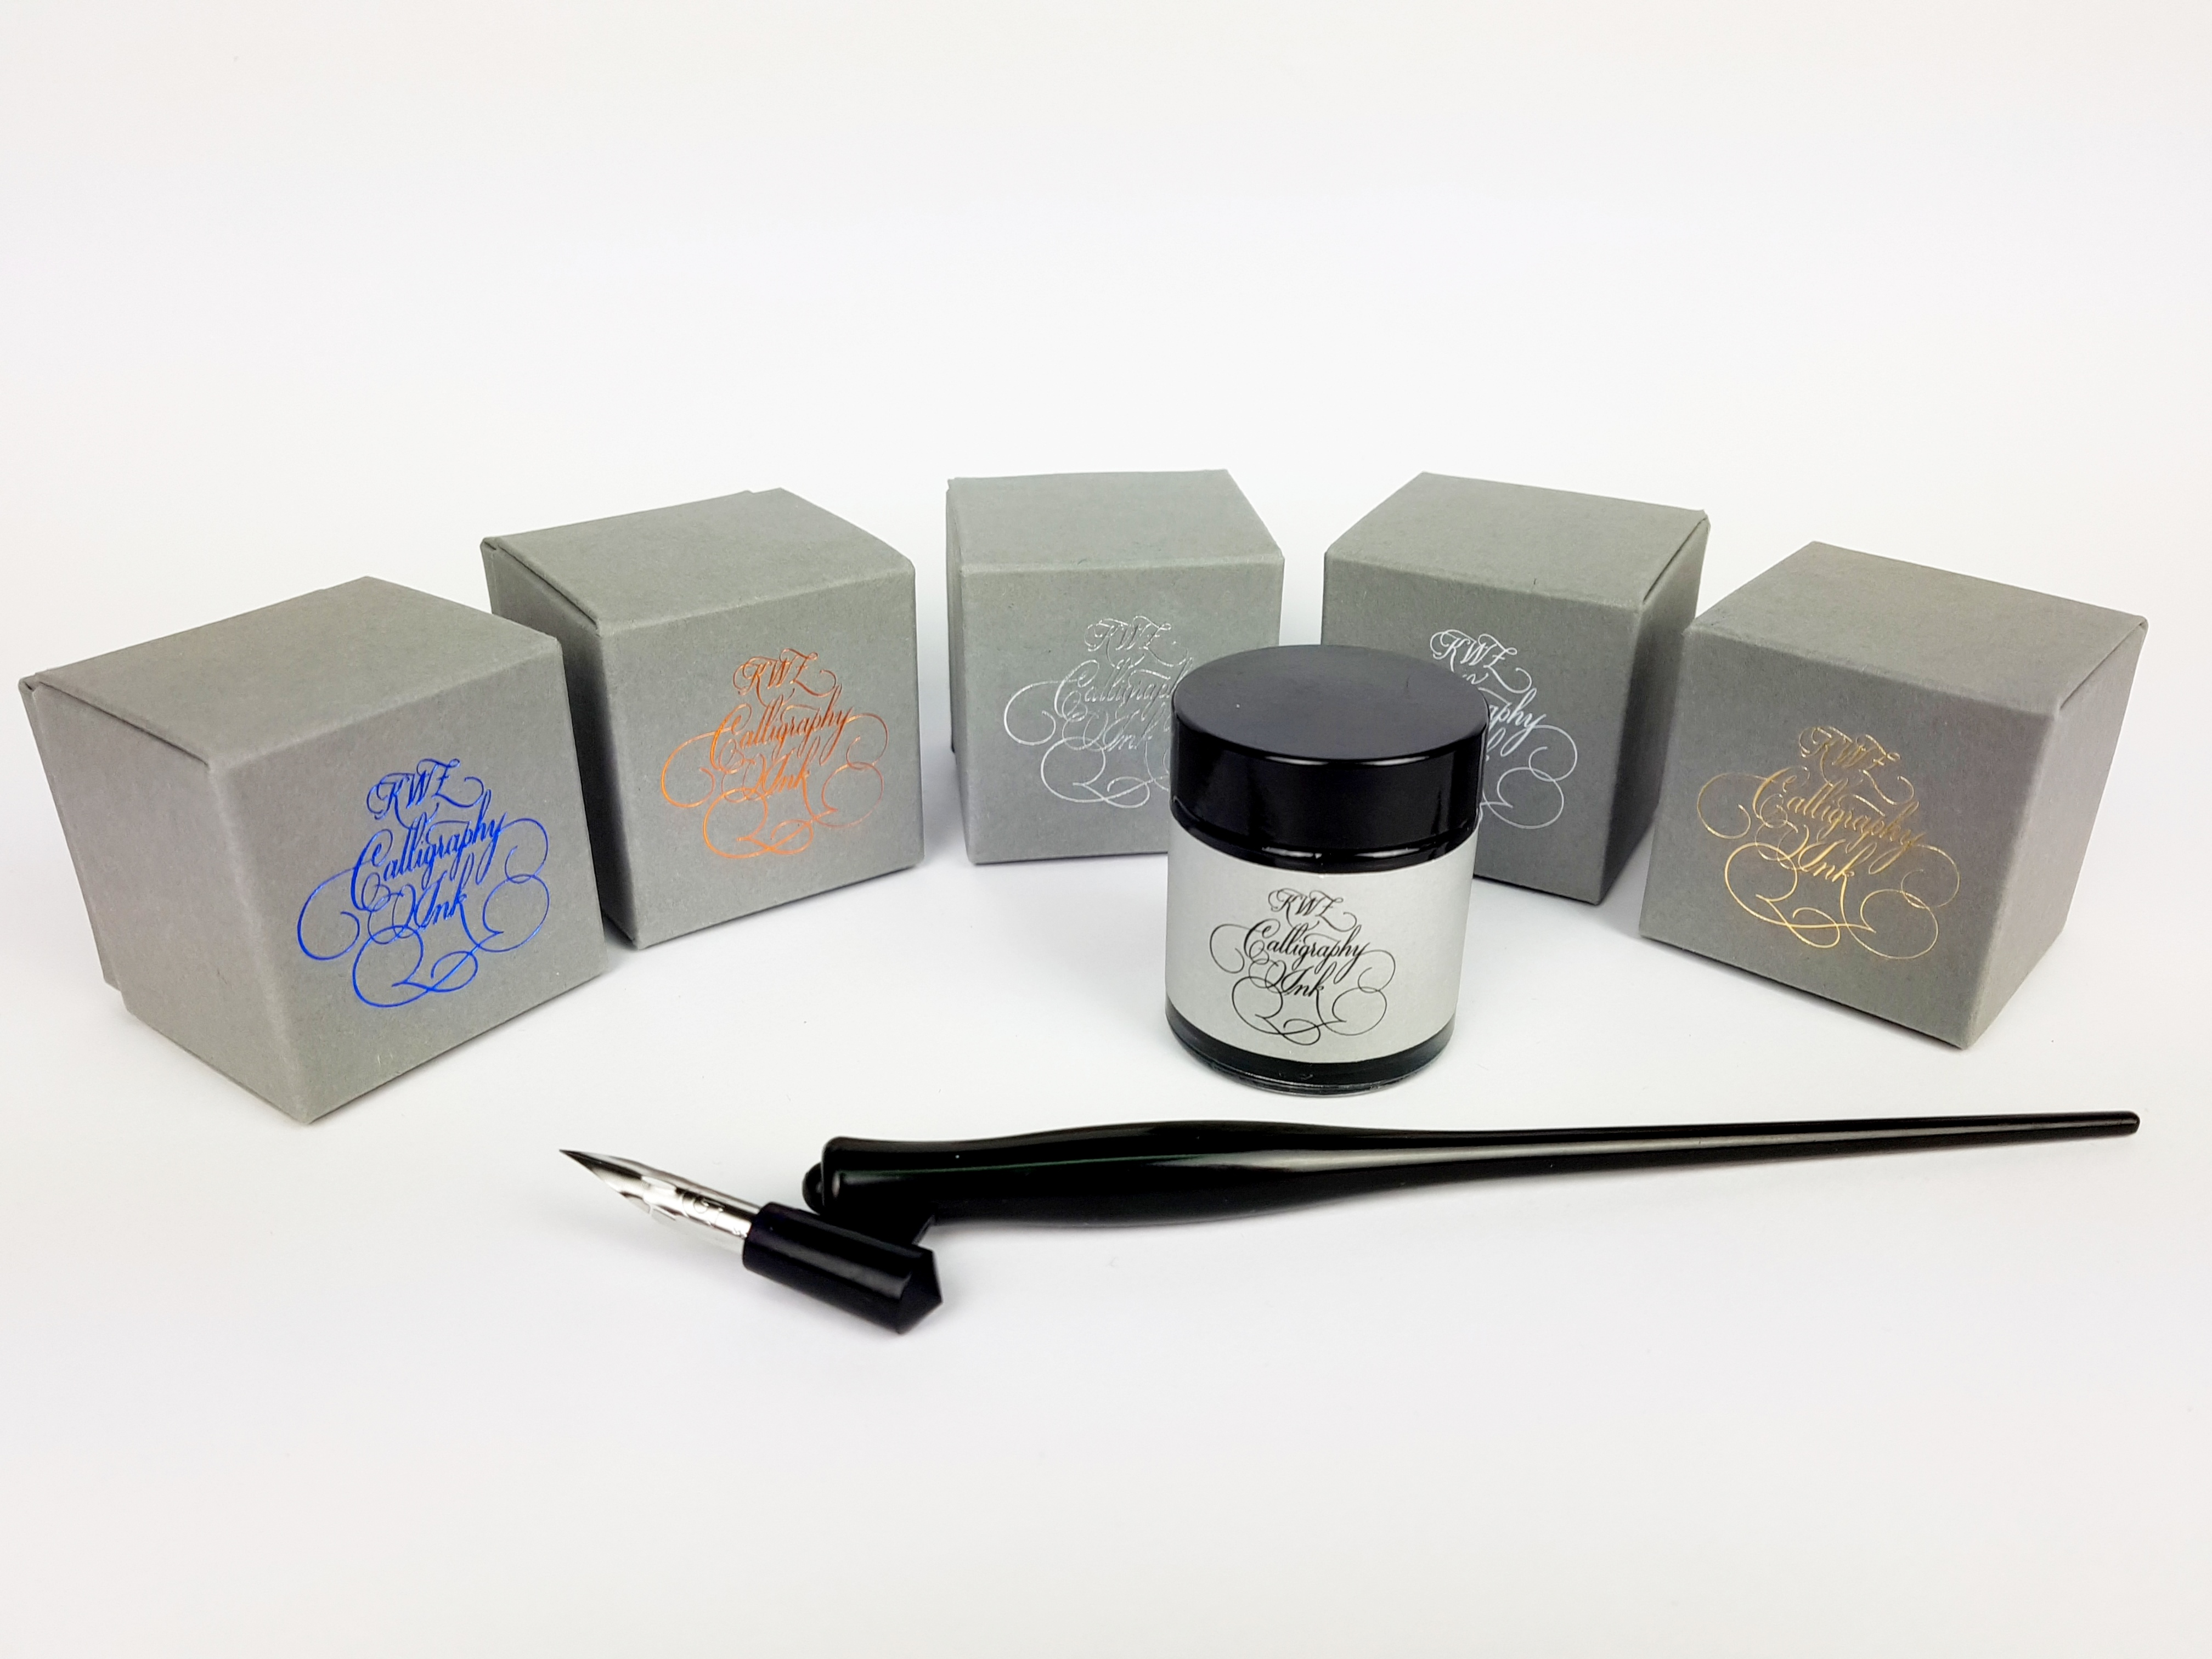 KWZ Calligraphy Ink 25g White